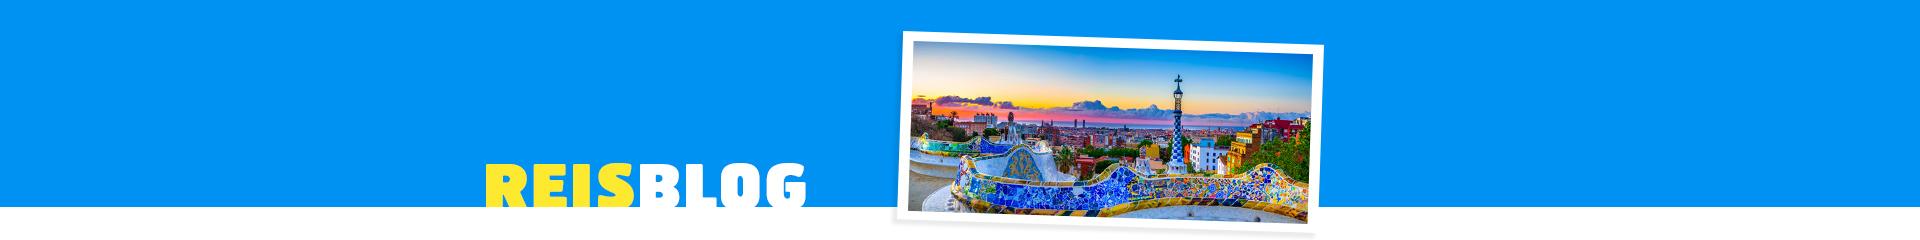 De mooiste steden van Zuid-Europa